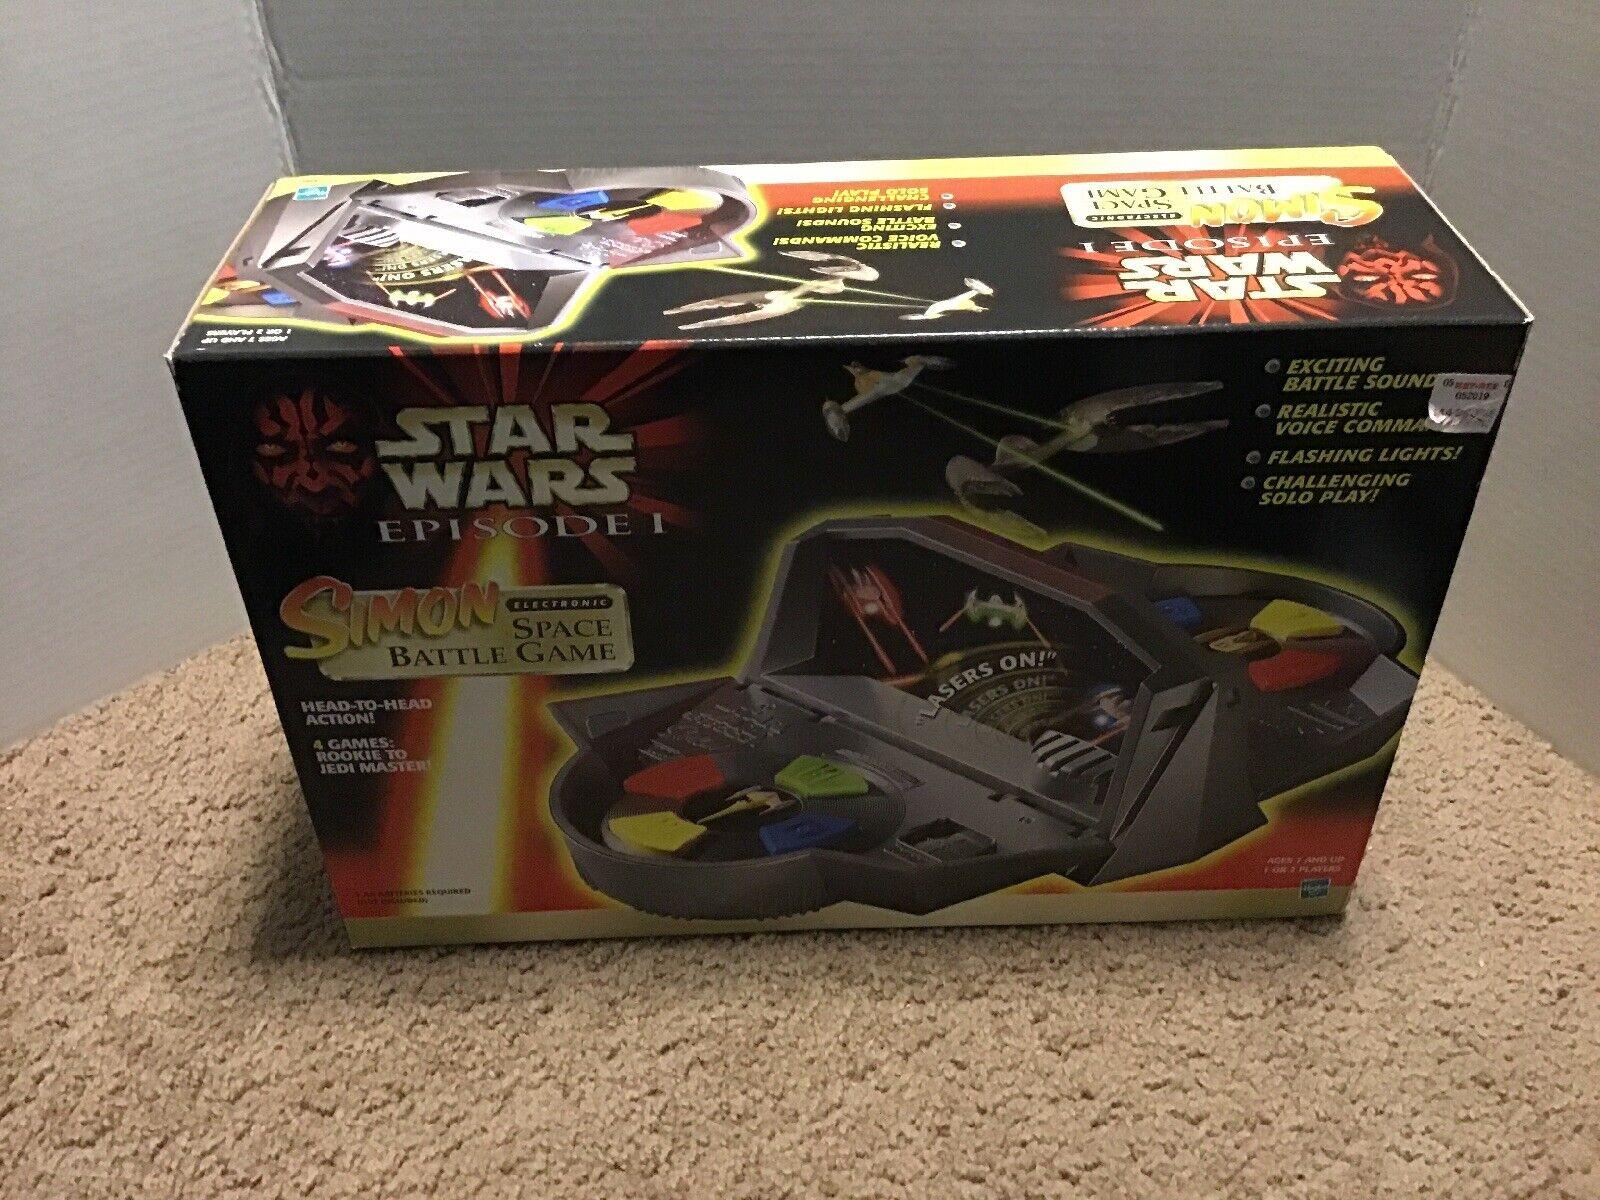 Vintage Star Wars Episode 1 Simon Says Electronic Space Battle Game Hasbro 1999